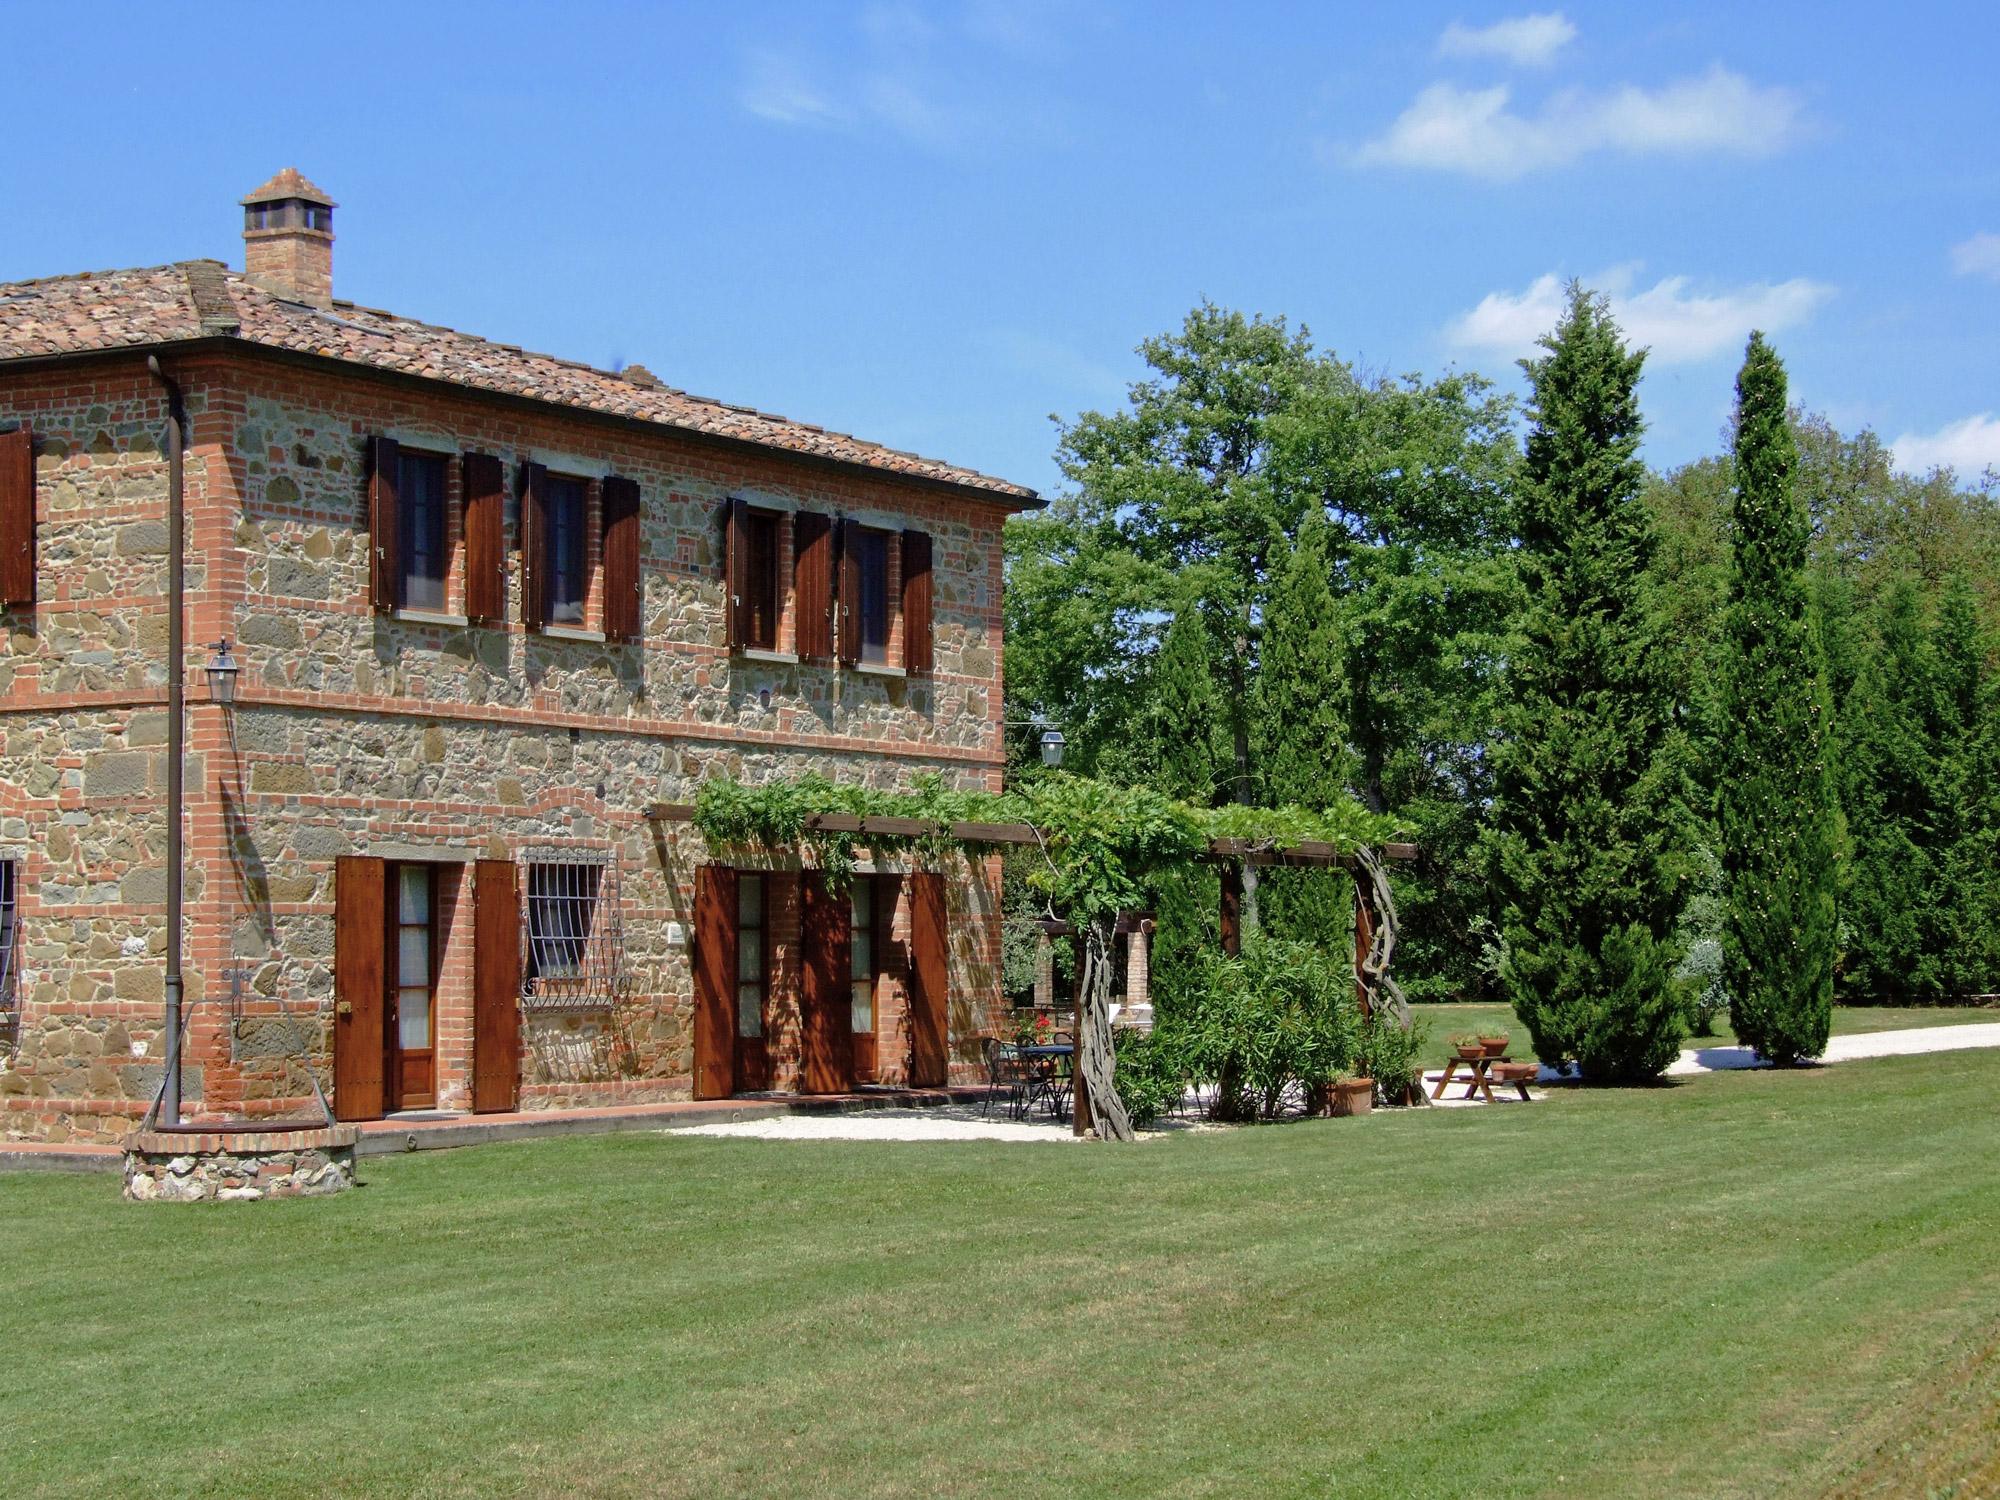 Casale con piscina in vendita in toscana vicino pienza e montepulciano moulin - Casale in toscana ...